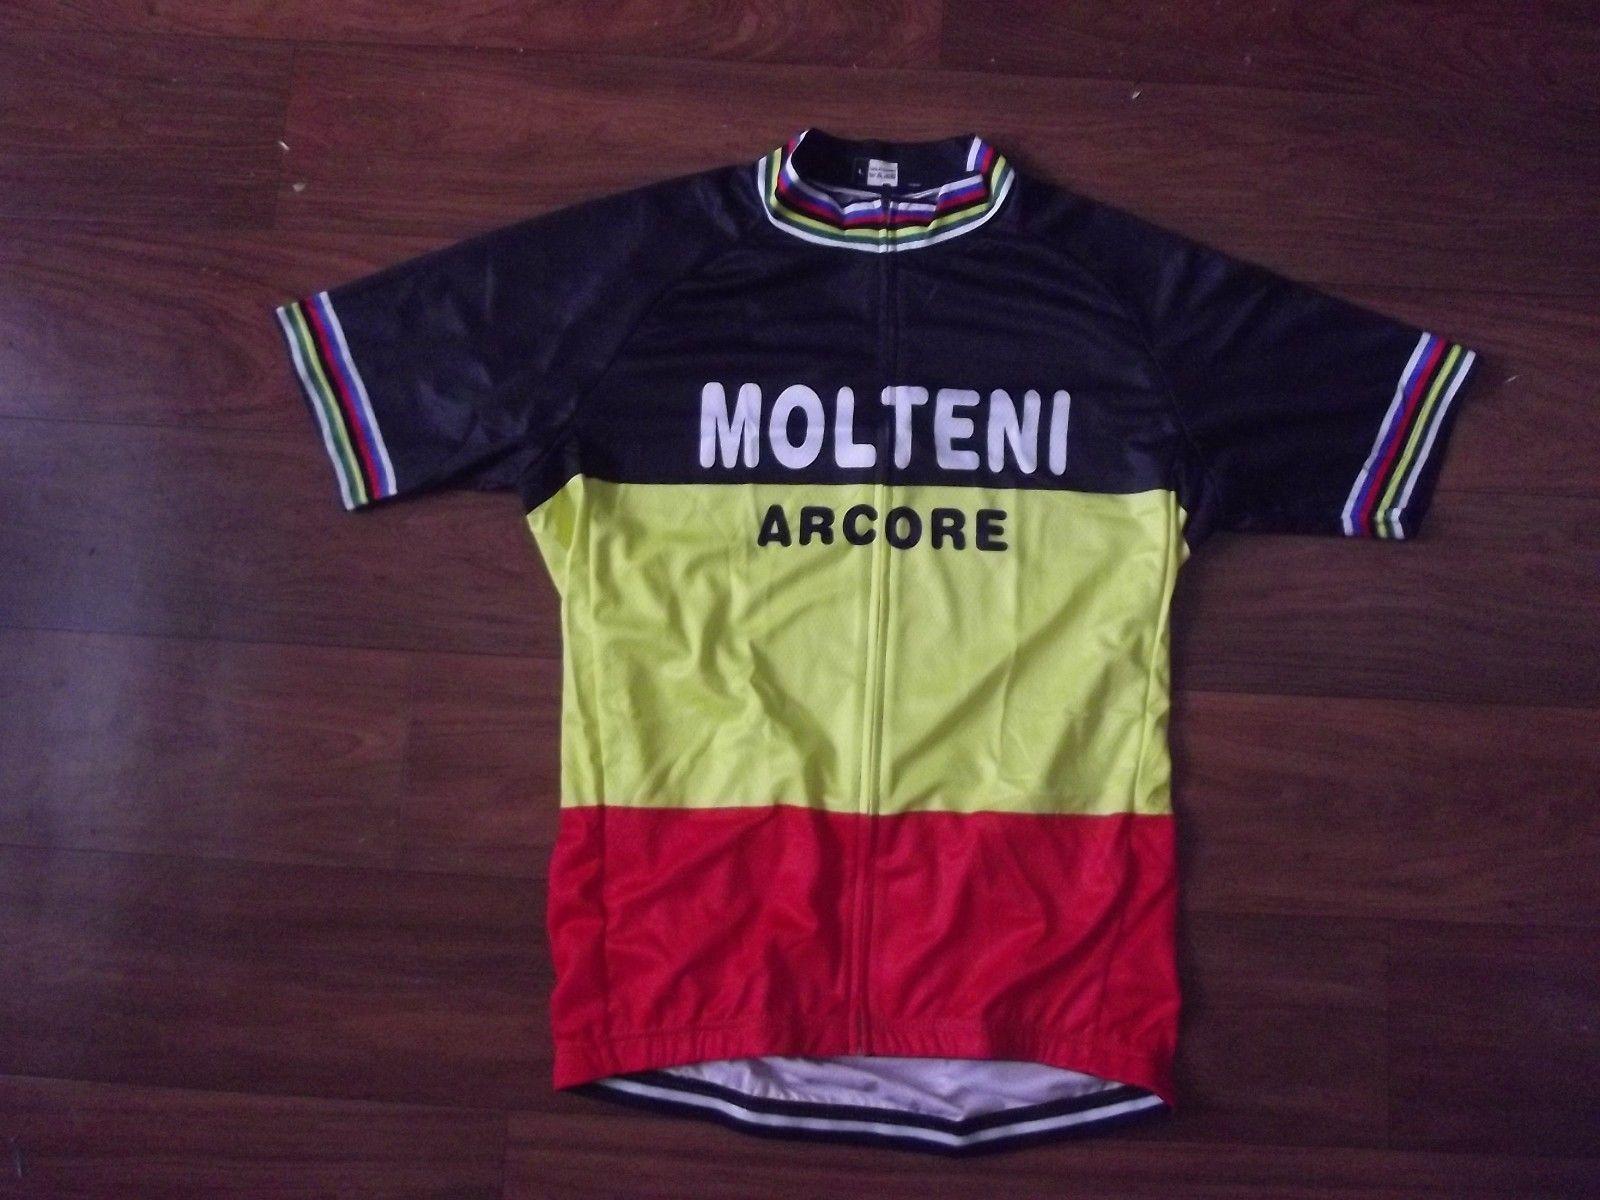 MOLTENI ARCORE RETRO 망 Ropa Ciclismo 사이클링 의류 / MTB 자전거 의류 / 자전거 의류 / 2019 사이클링 유니폼 사이클링 유니폼 2XS - 6XL P5